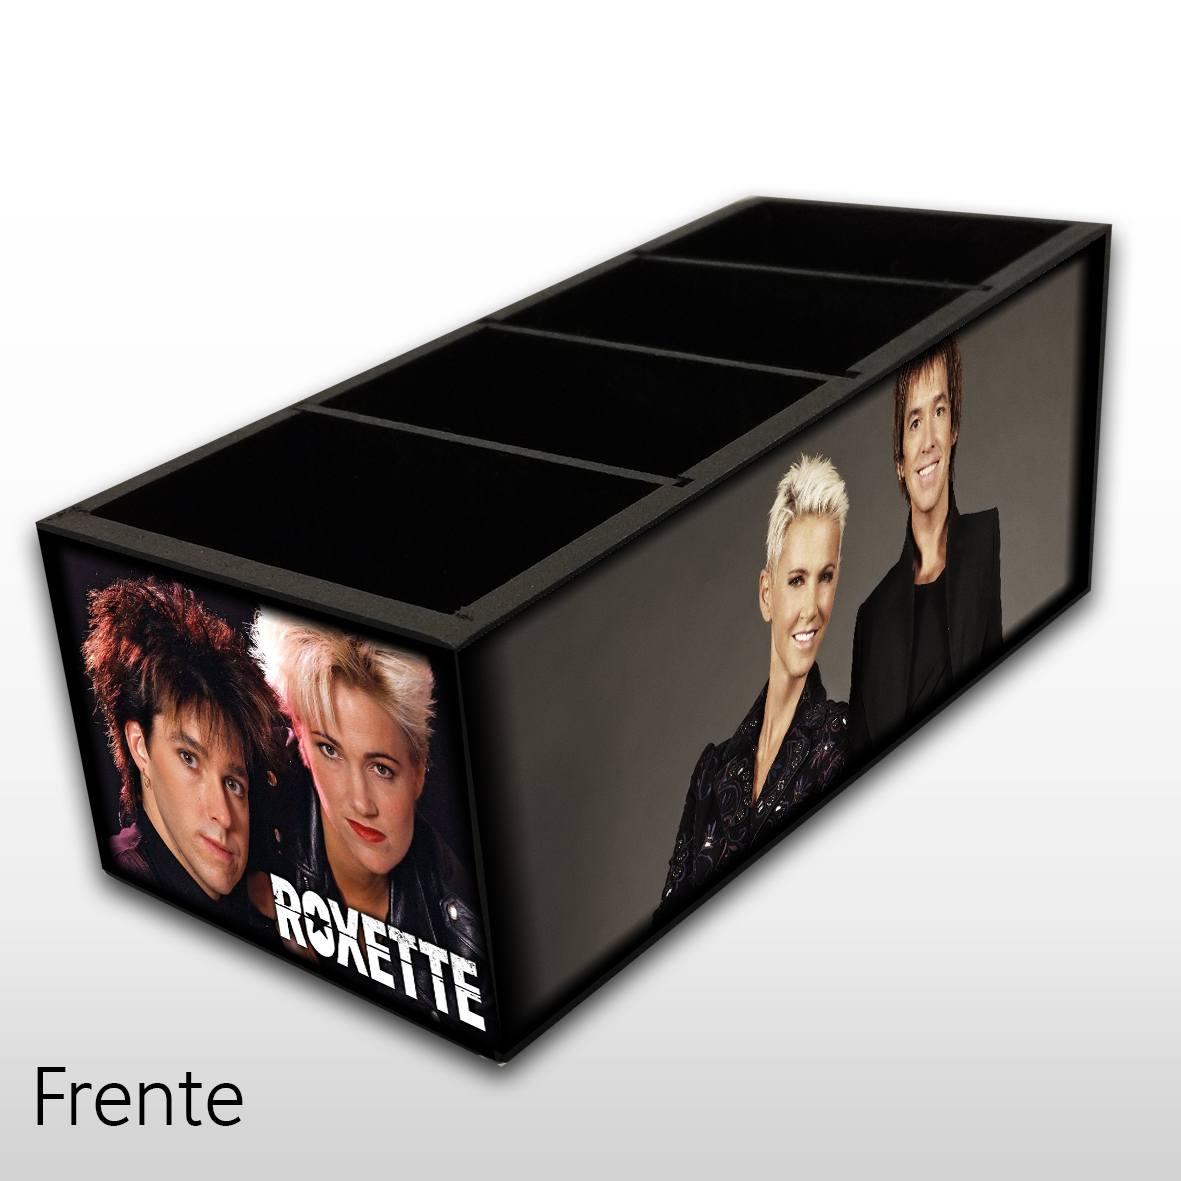 Roxette - Porta Controles MDF - 4 Espaços - Mr. Rock